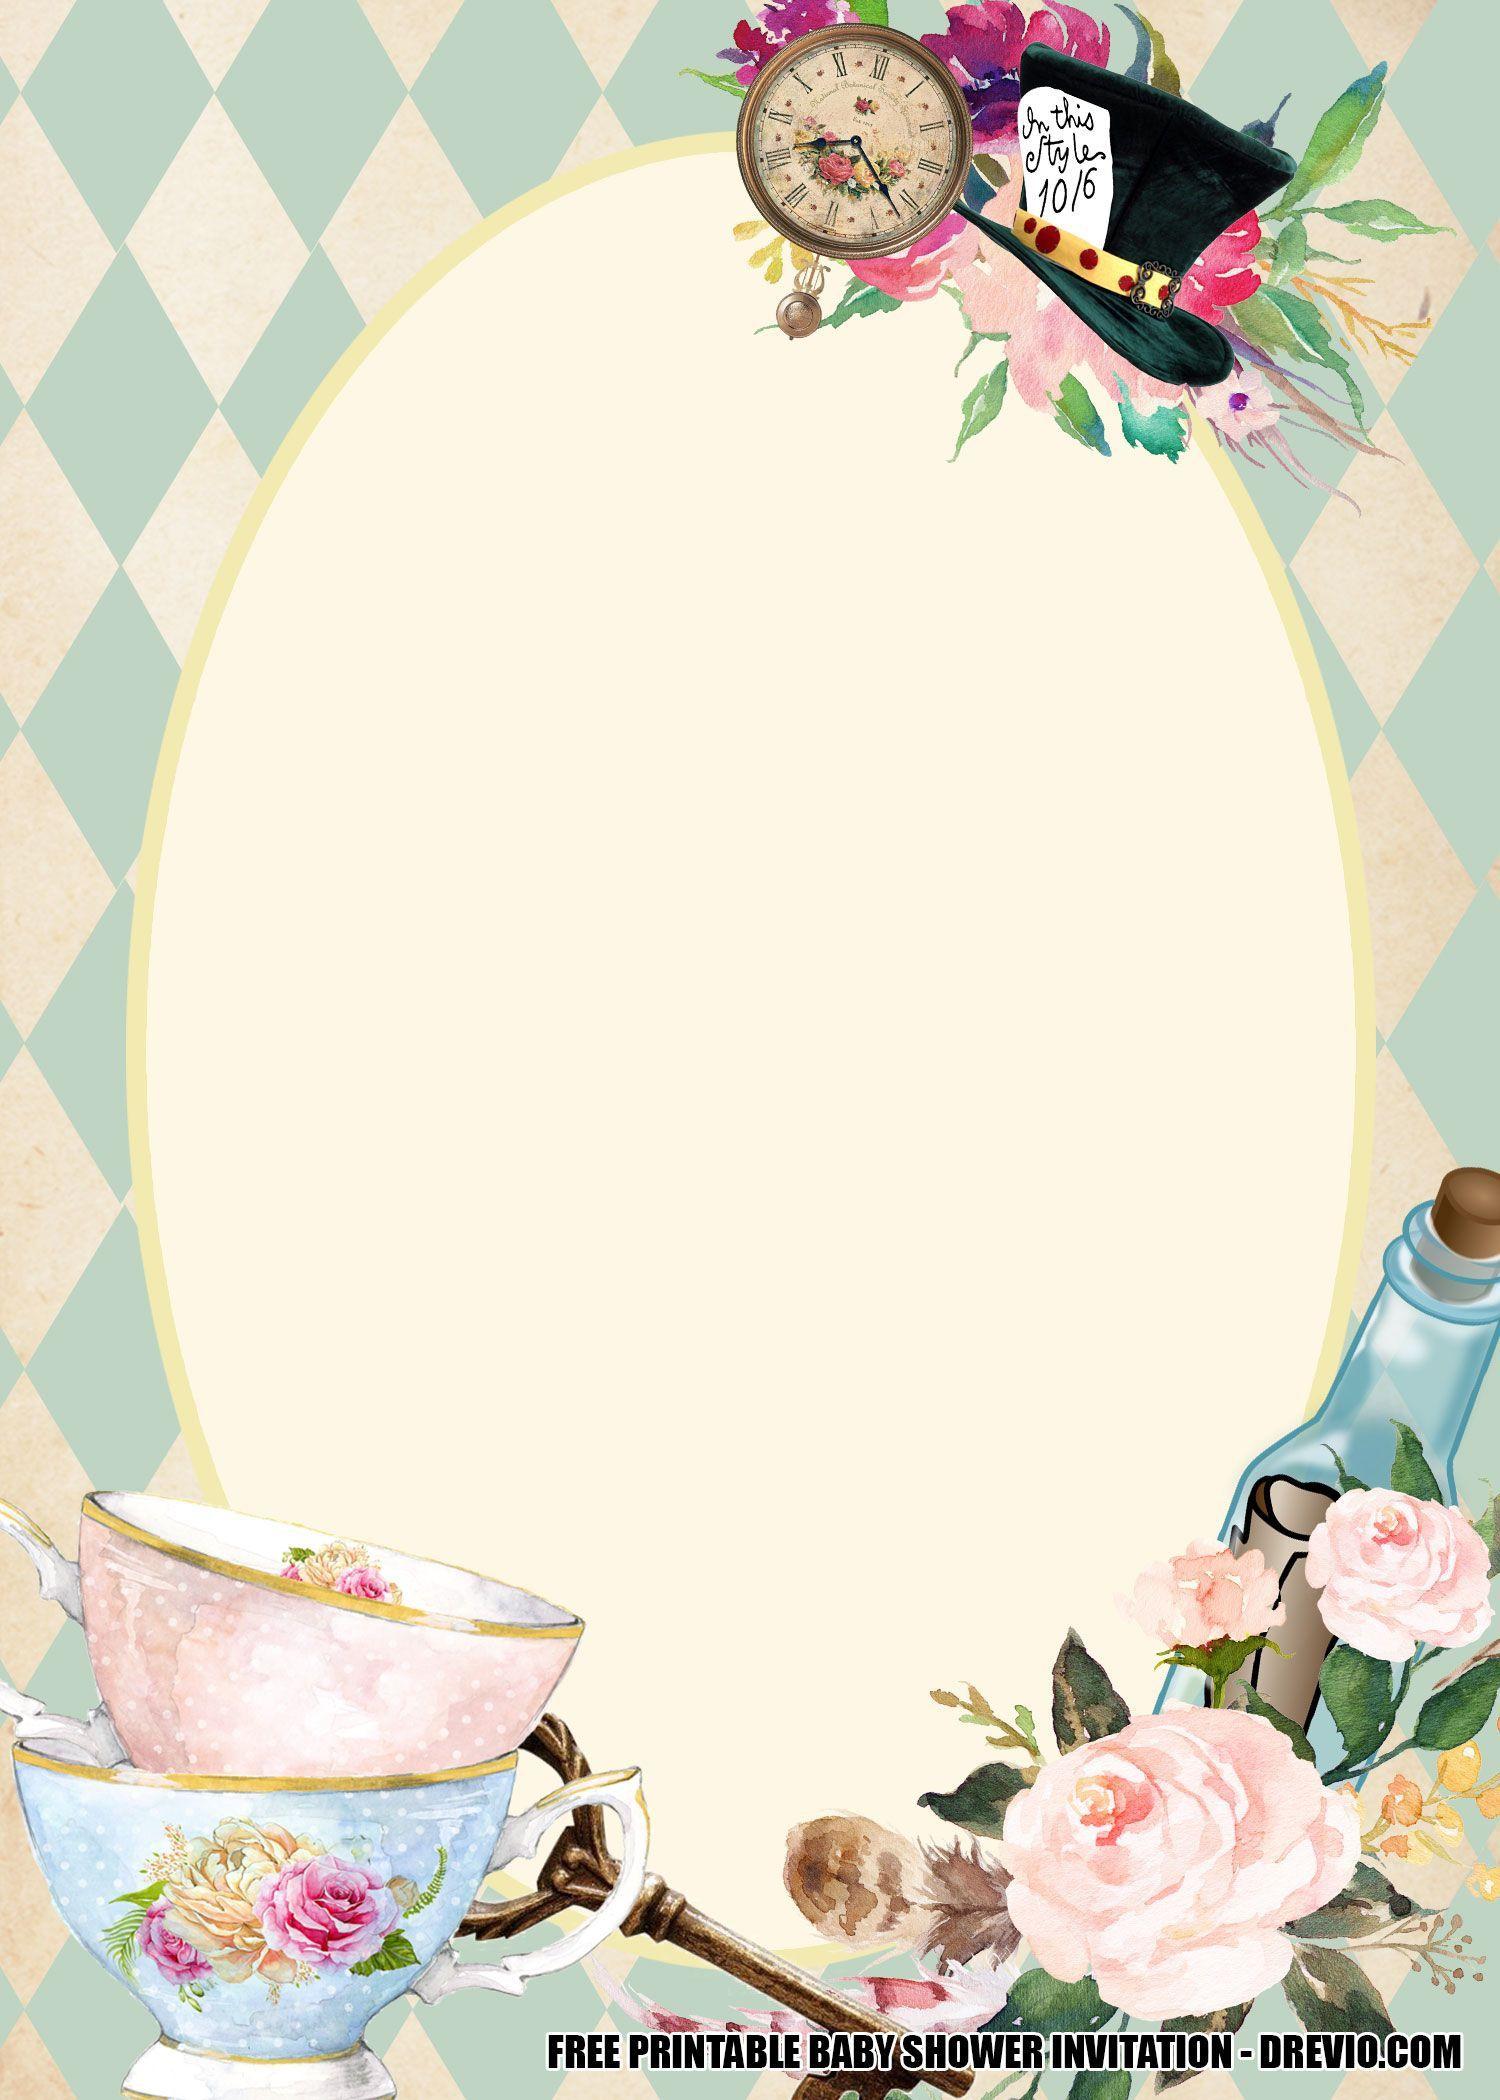 009 Imposing Alice In Wonderland Invitation Template High Resolution  Templates Wedding Birthday Free Tea PartyFull